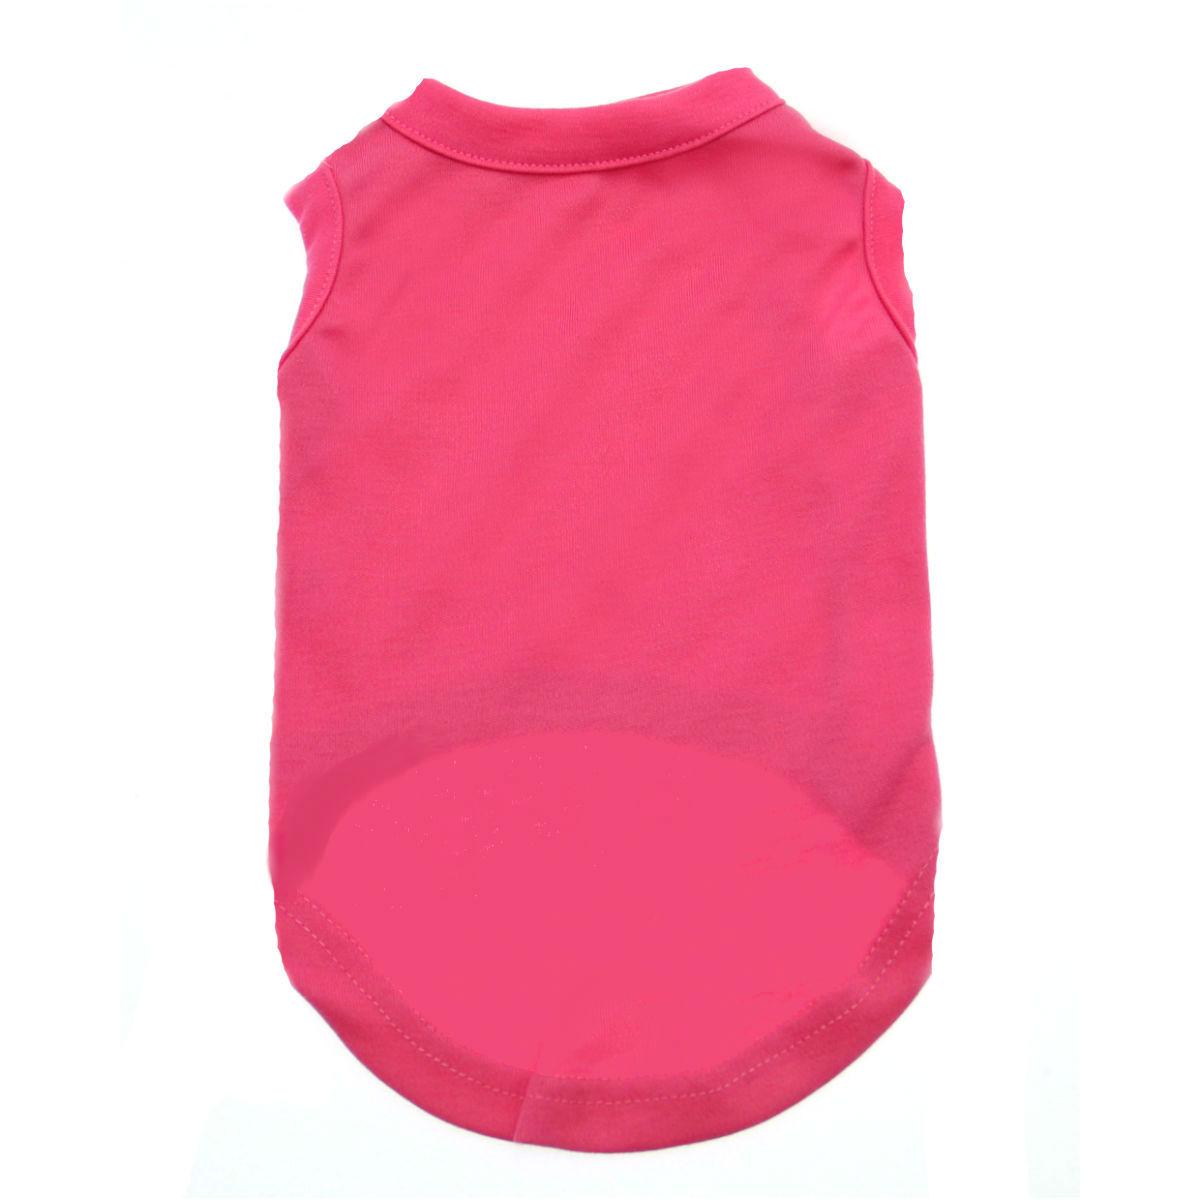 Plain Dog Shirt - Bright Pink